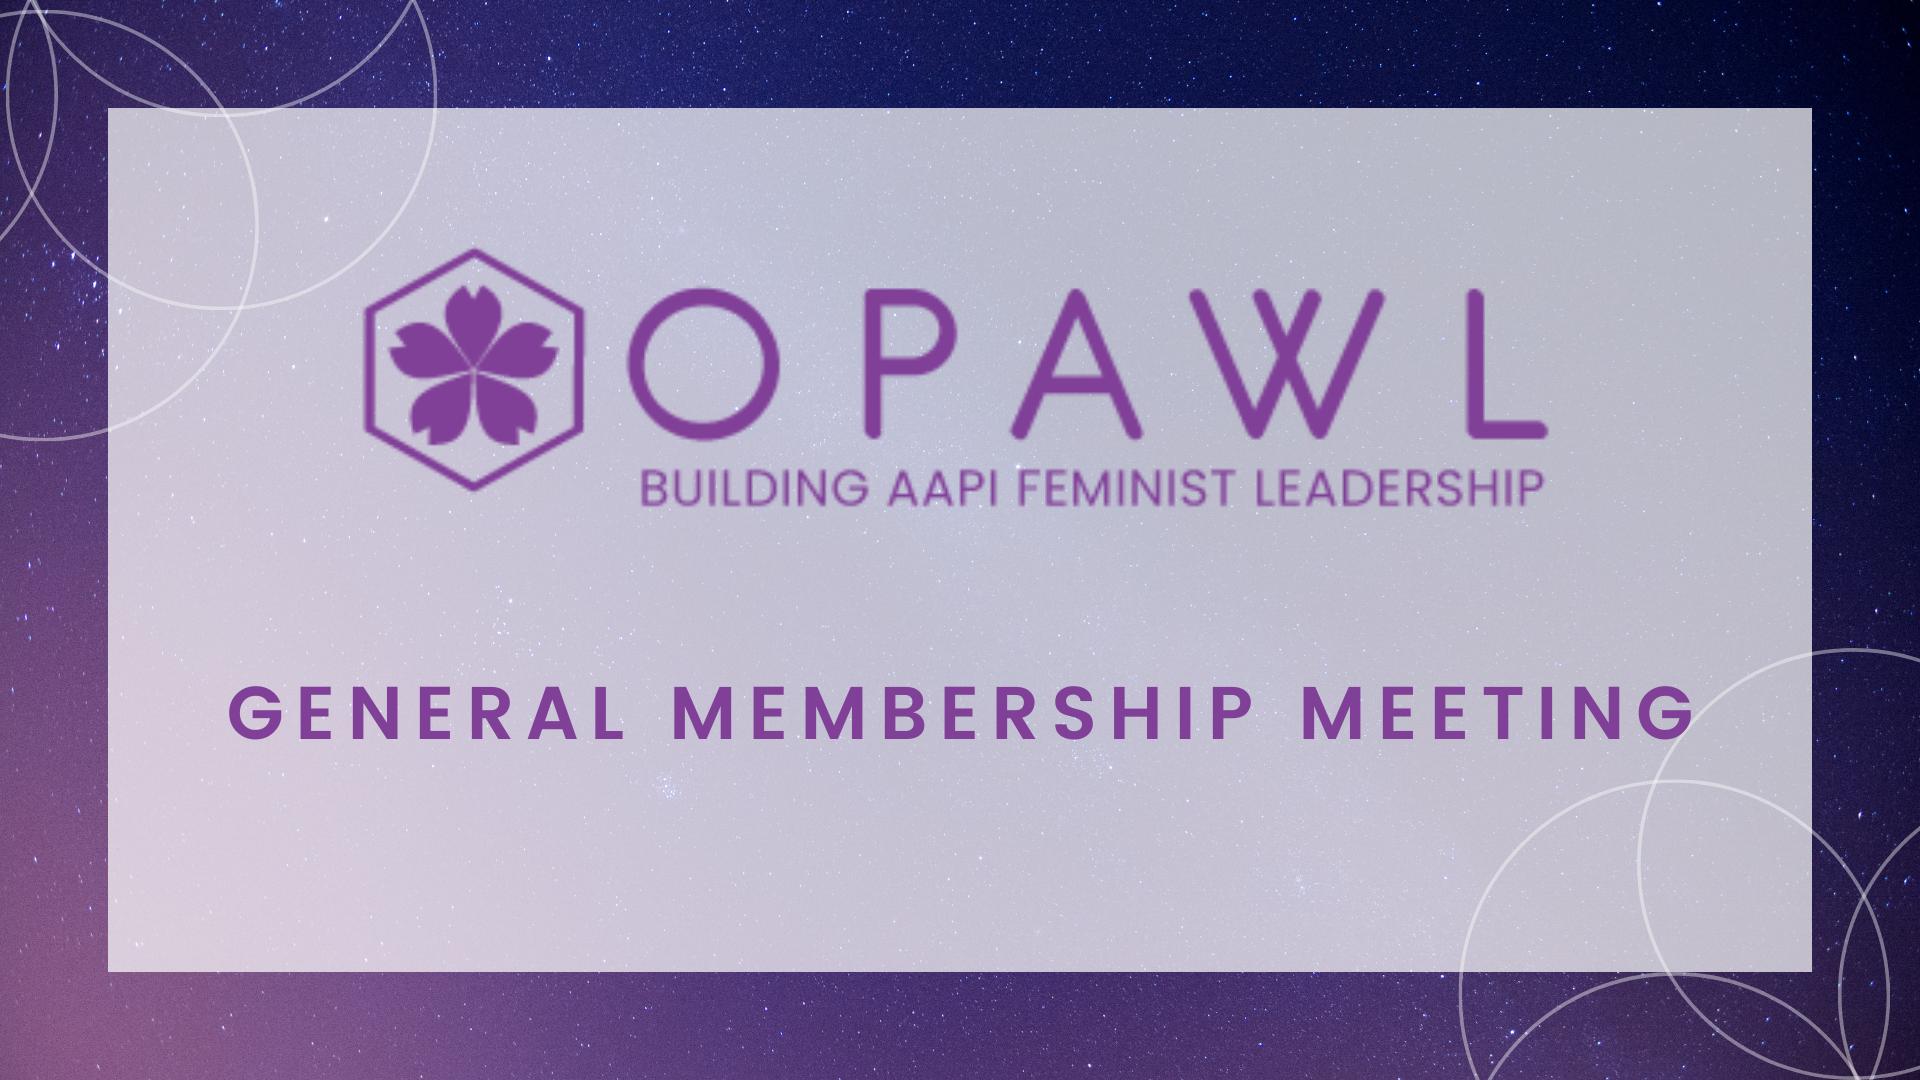 OPAWL general membership meeting